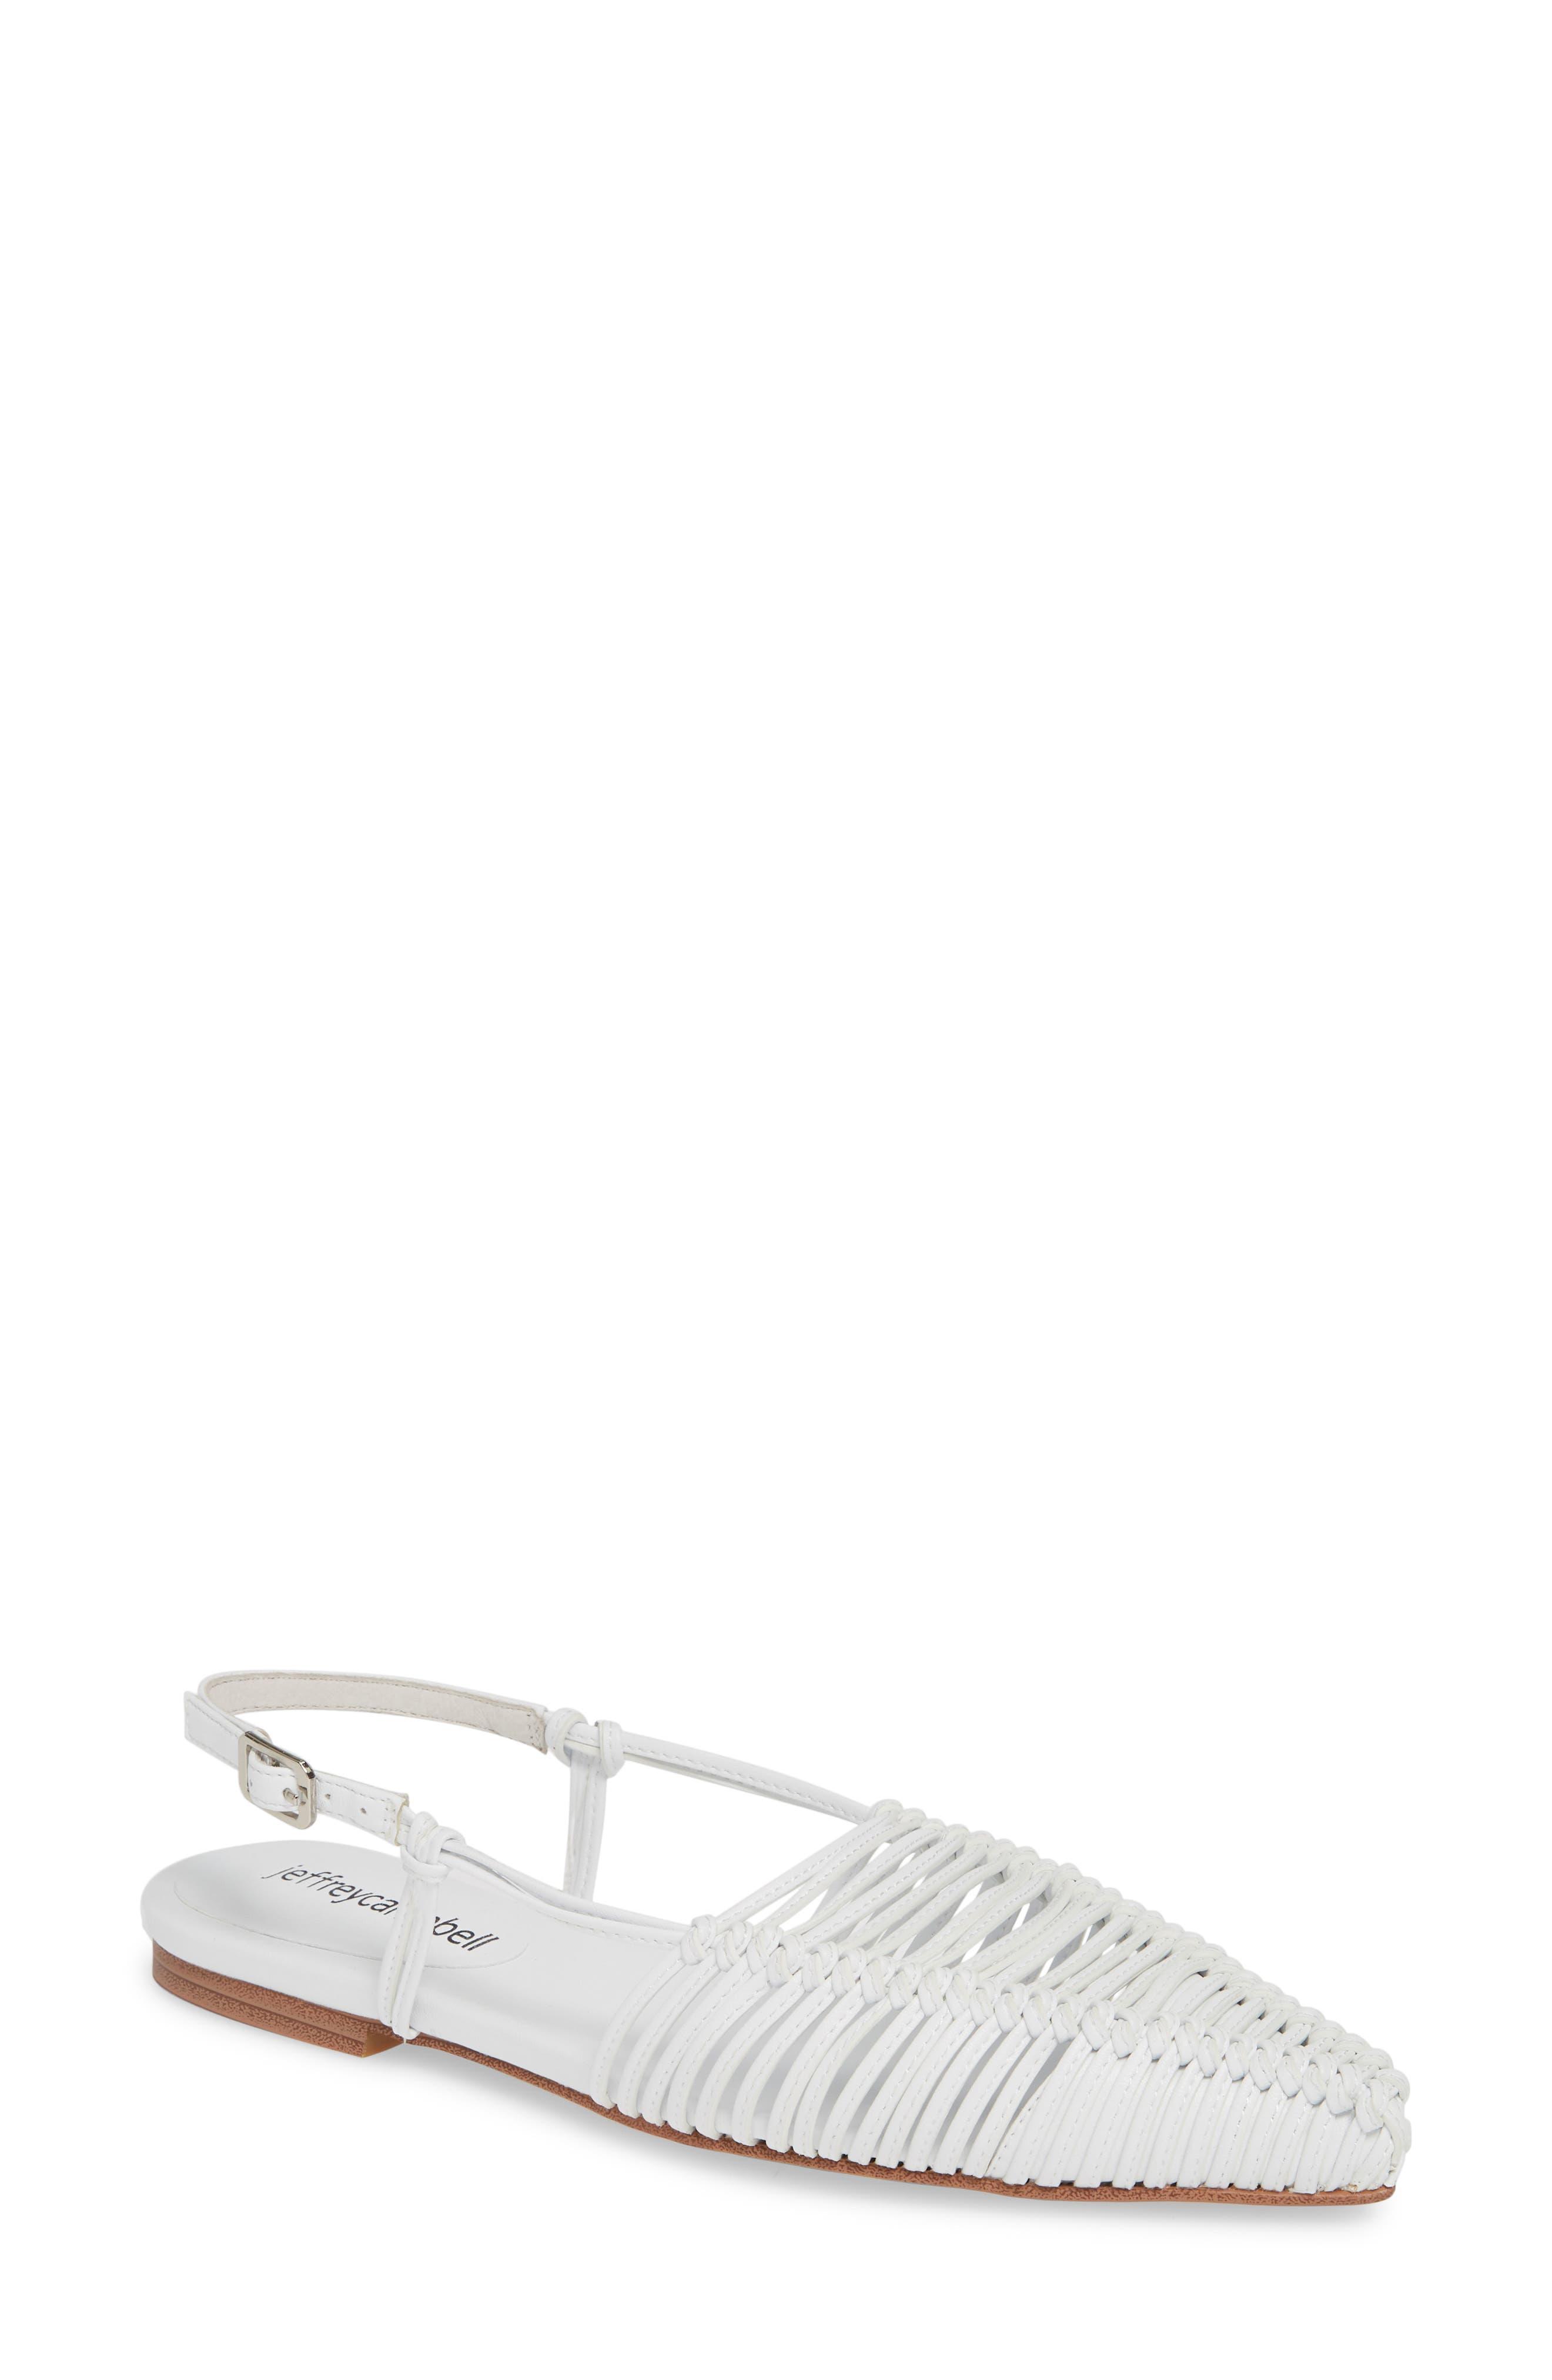 JEFFREY CAMPBELL Myron Flat, Main, color, WHITE LEATHER